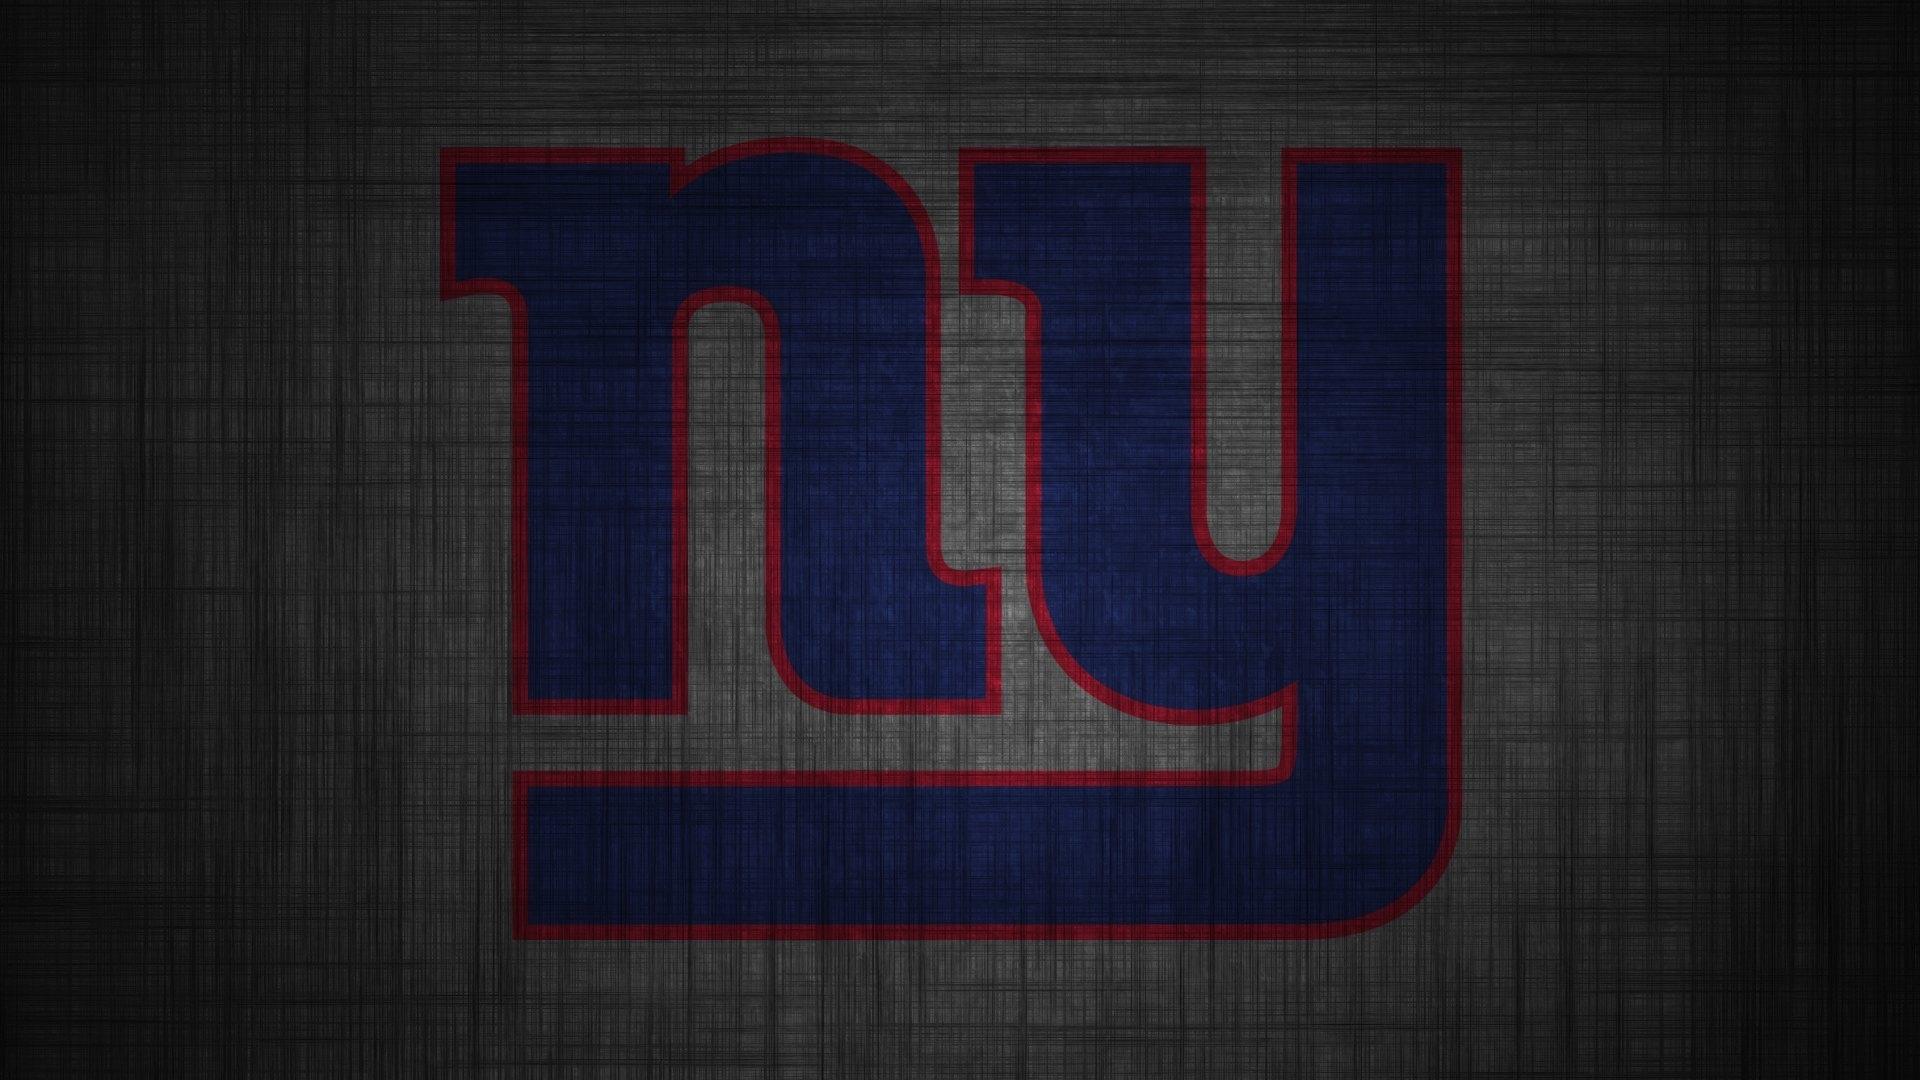 new york giants logo wallpaper 55990 1920x1080 px ~ hdwallsource